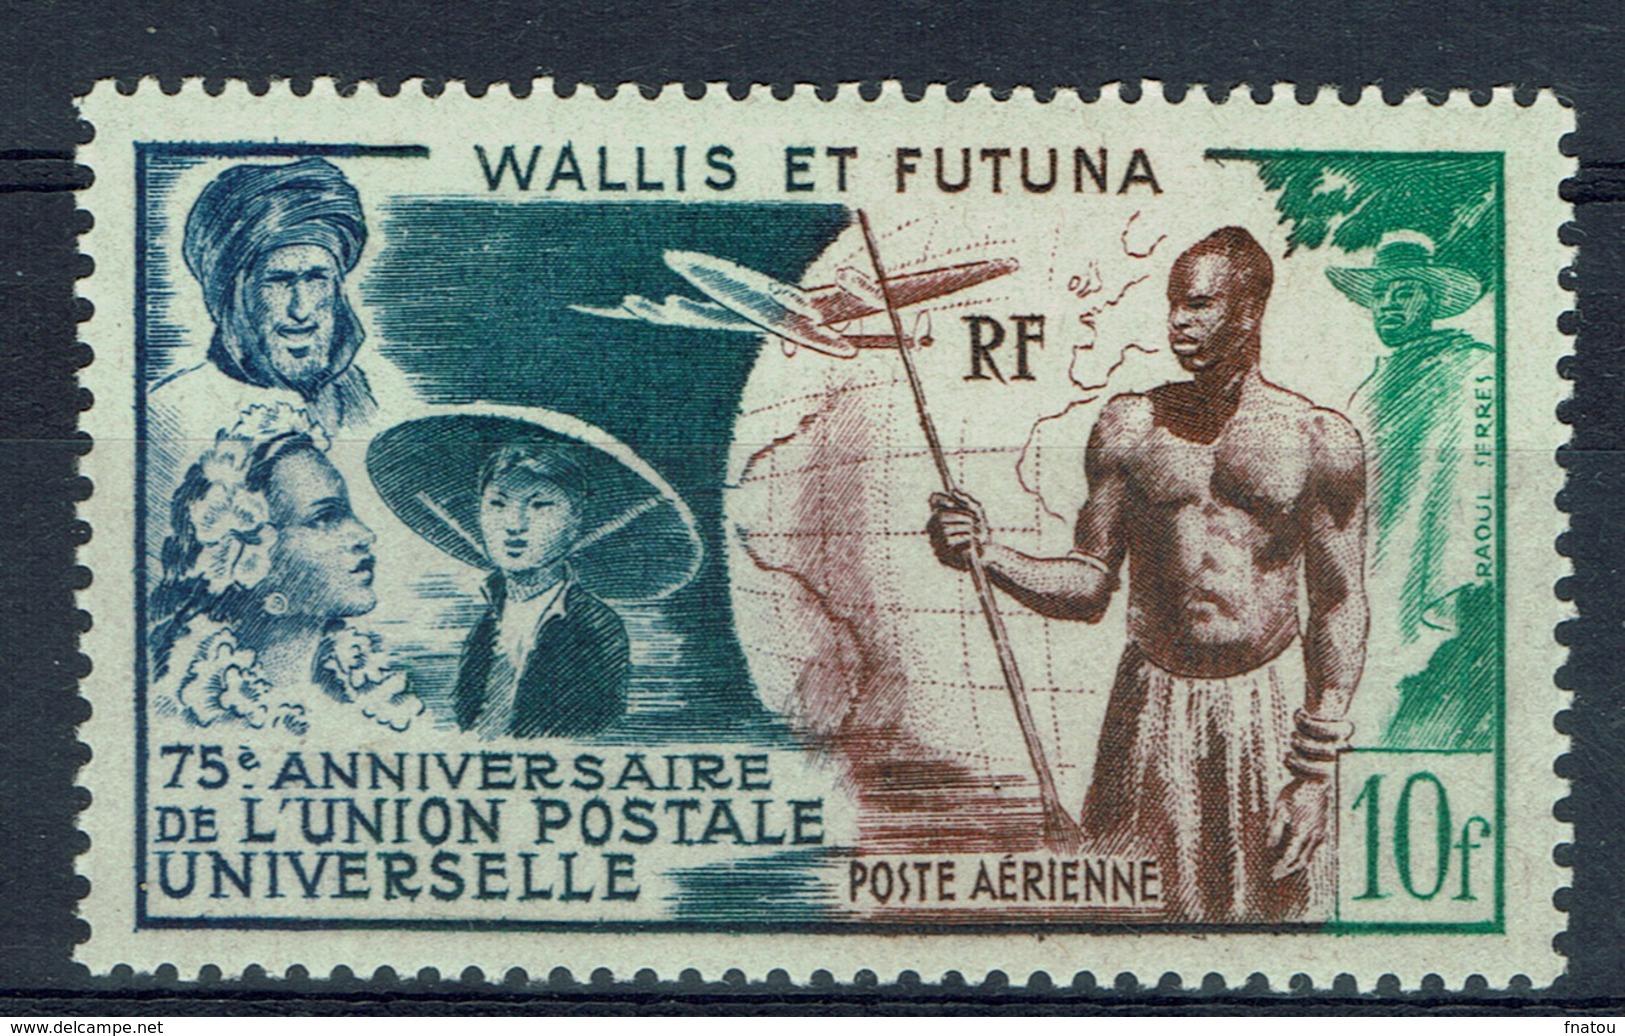 Wallis And Futuna, Universal Postal Union, 1949, MH VF - Airmail